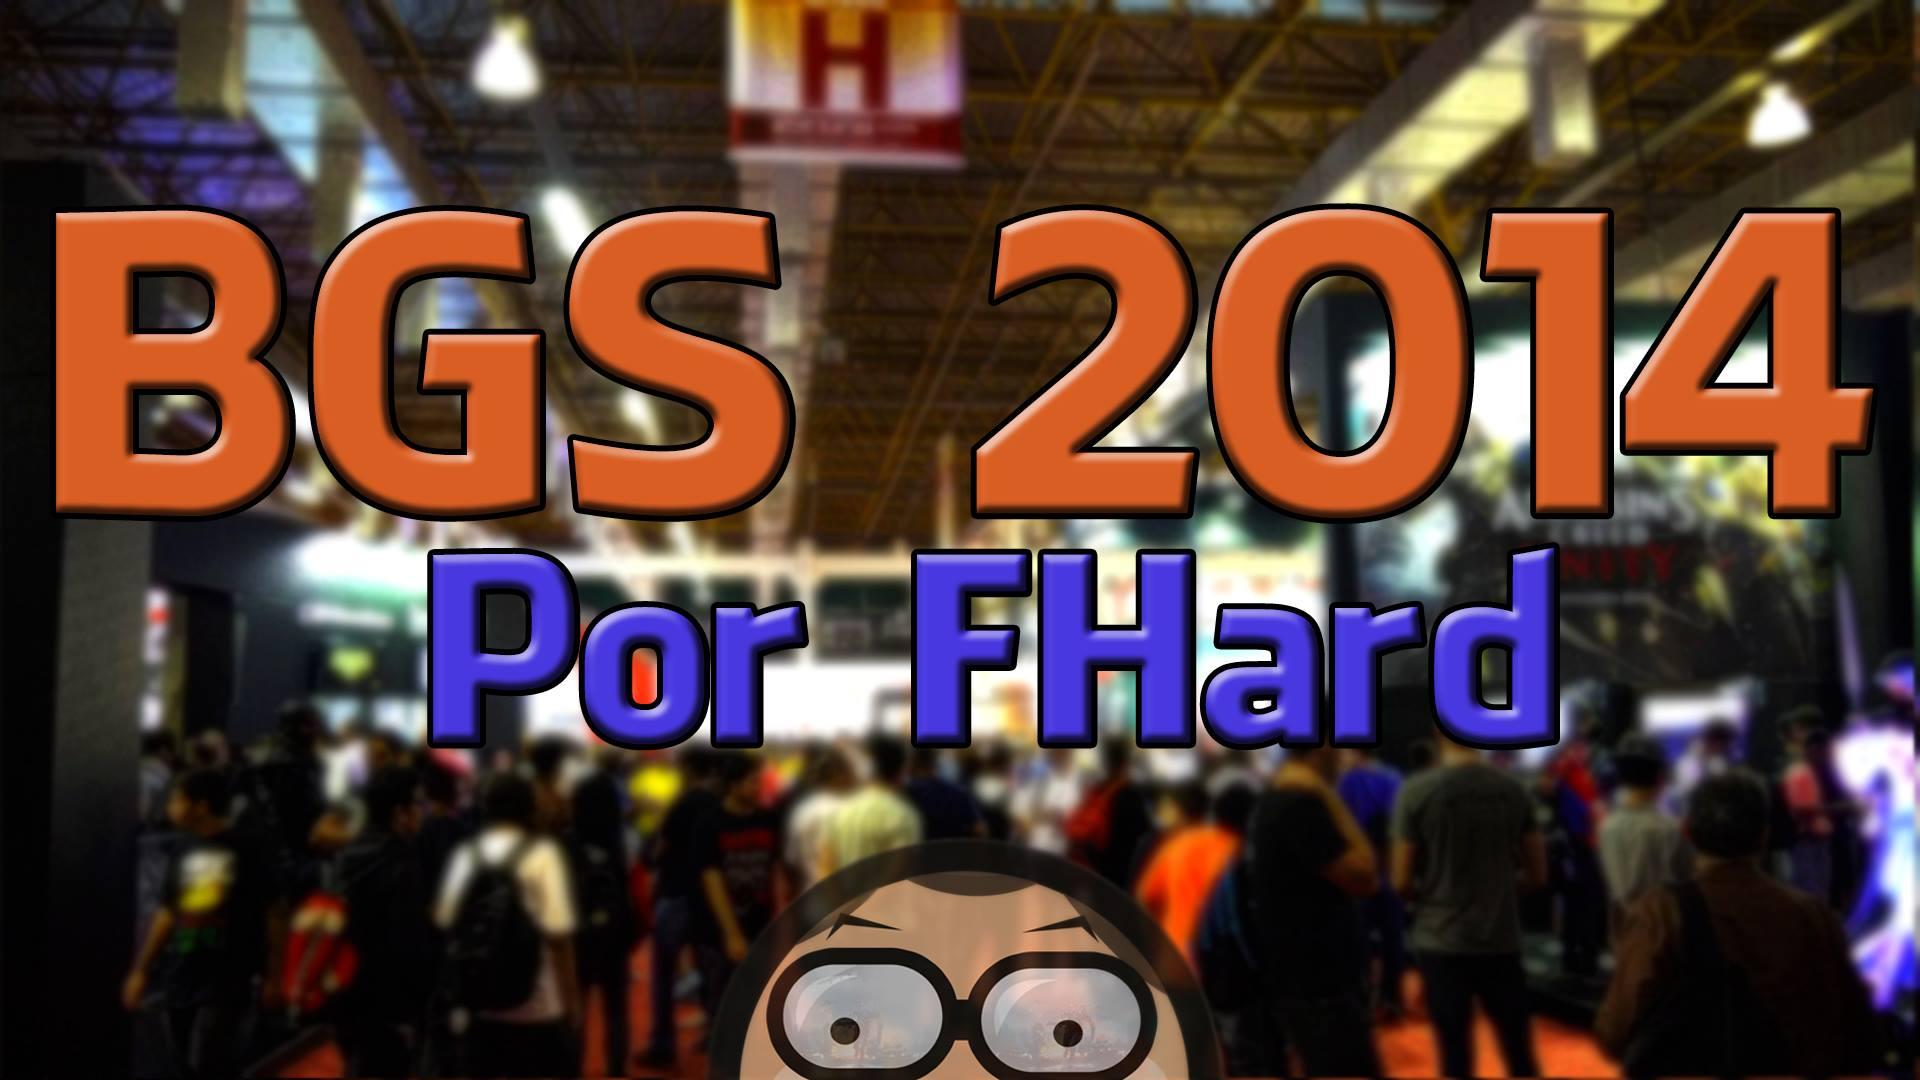 BGS 2014 - FHard - Imagem